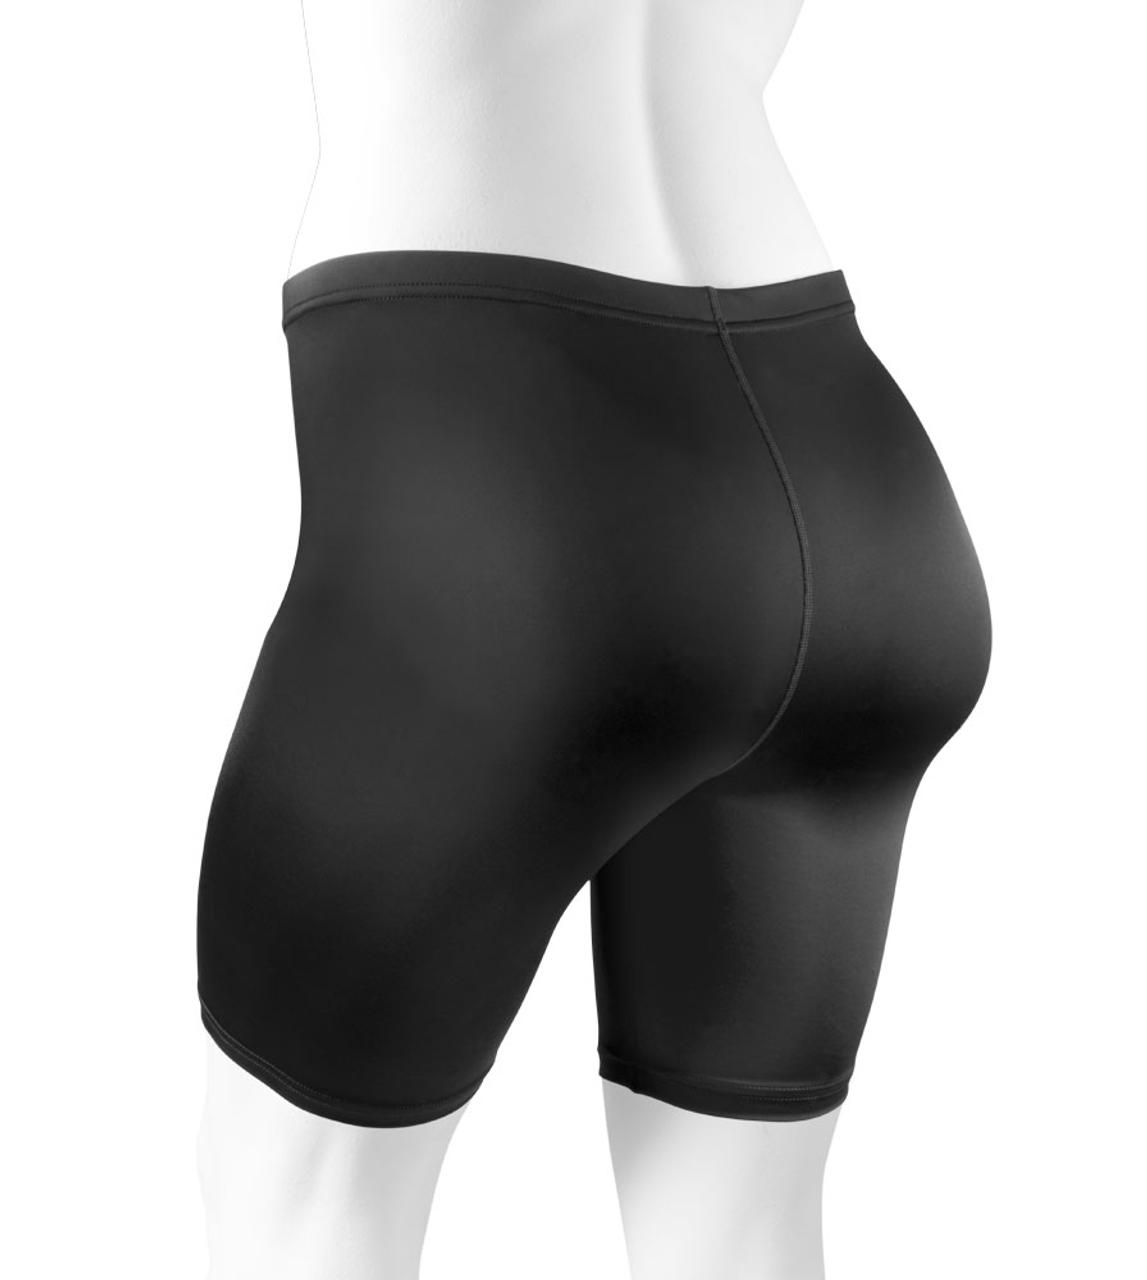 23a7296c293 Plus Size Women s Classic Unpadded Compression Workout Short Black Back